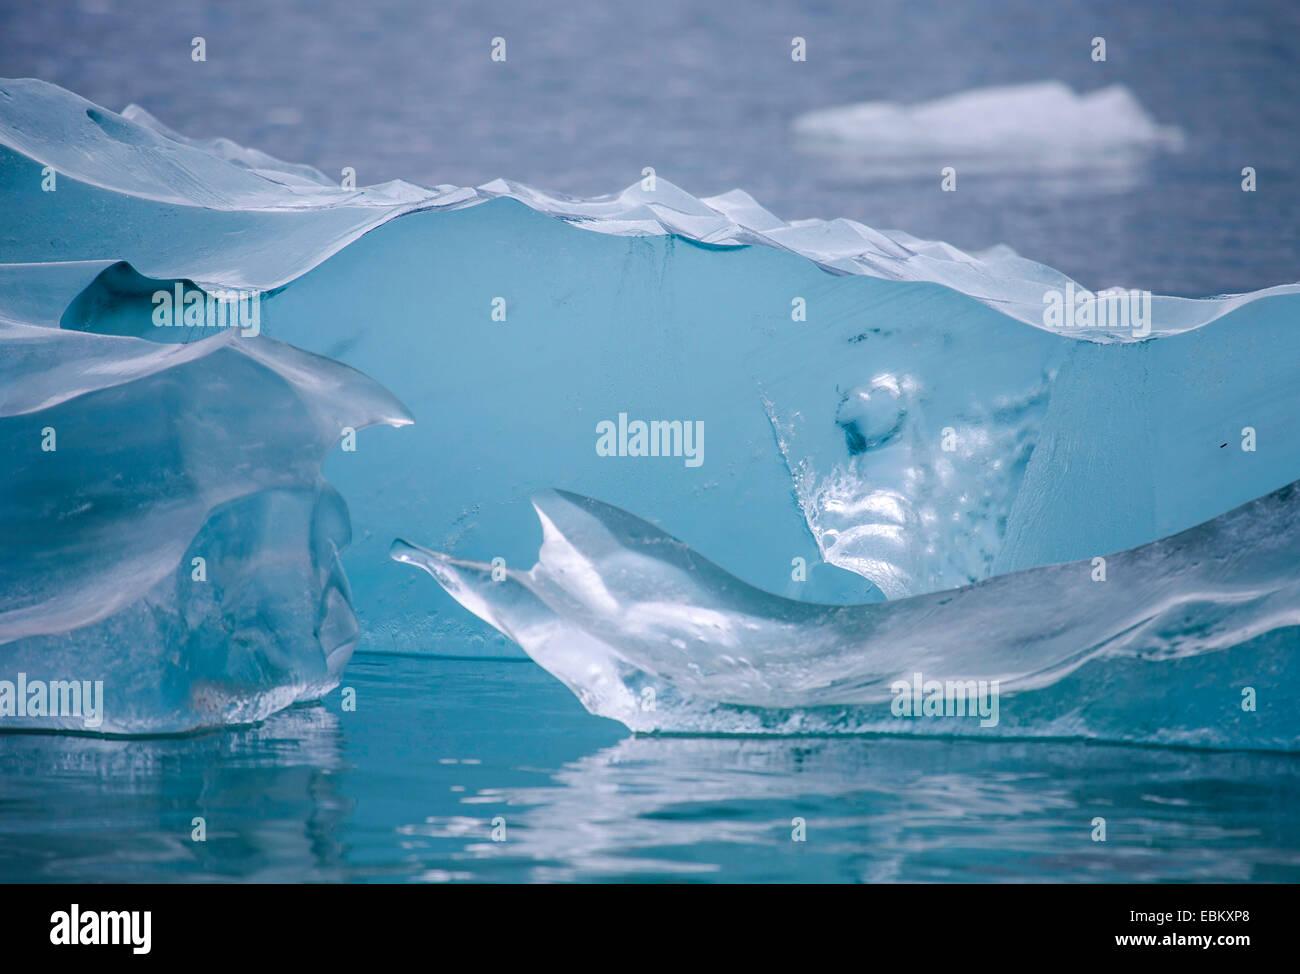 La glace de glacier, de forme bizarre la Norvège, Svalbard, Hamiltonbukta Photo Stock